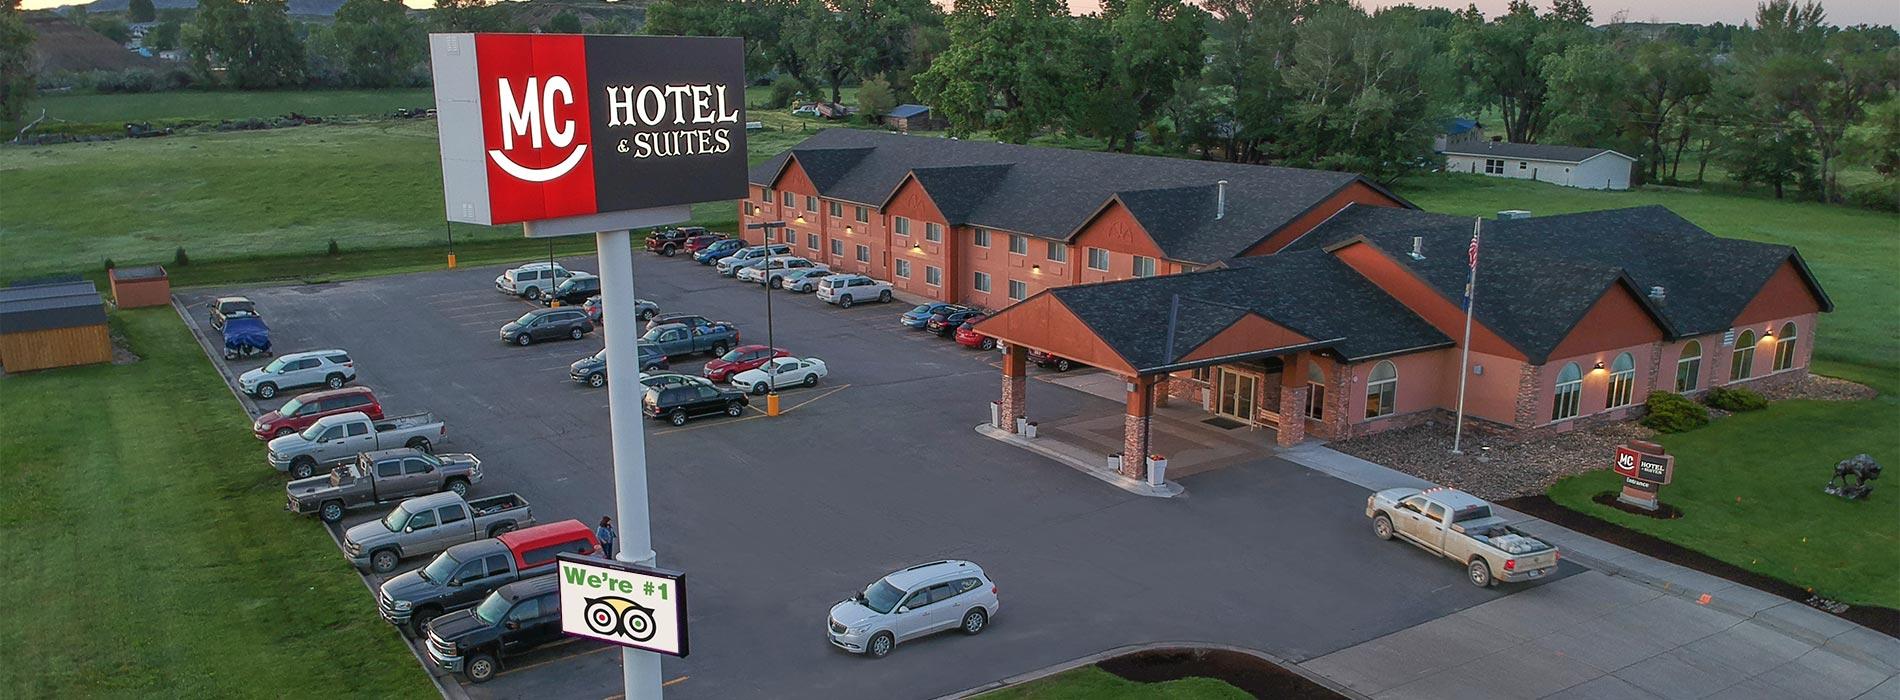 Miles City Hotel & Suites, Miles City Montana